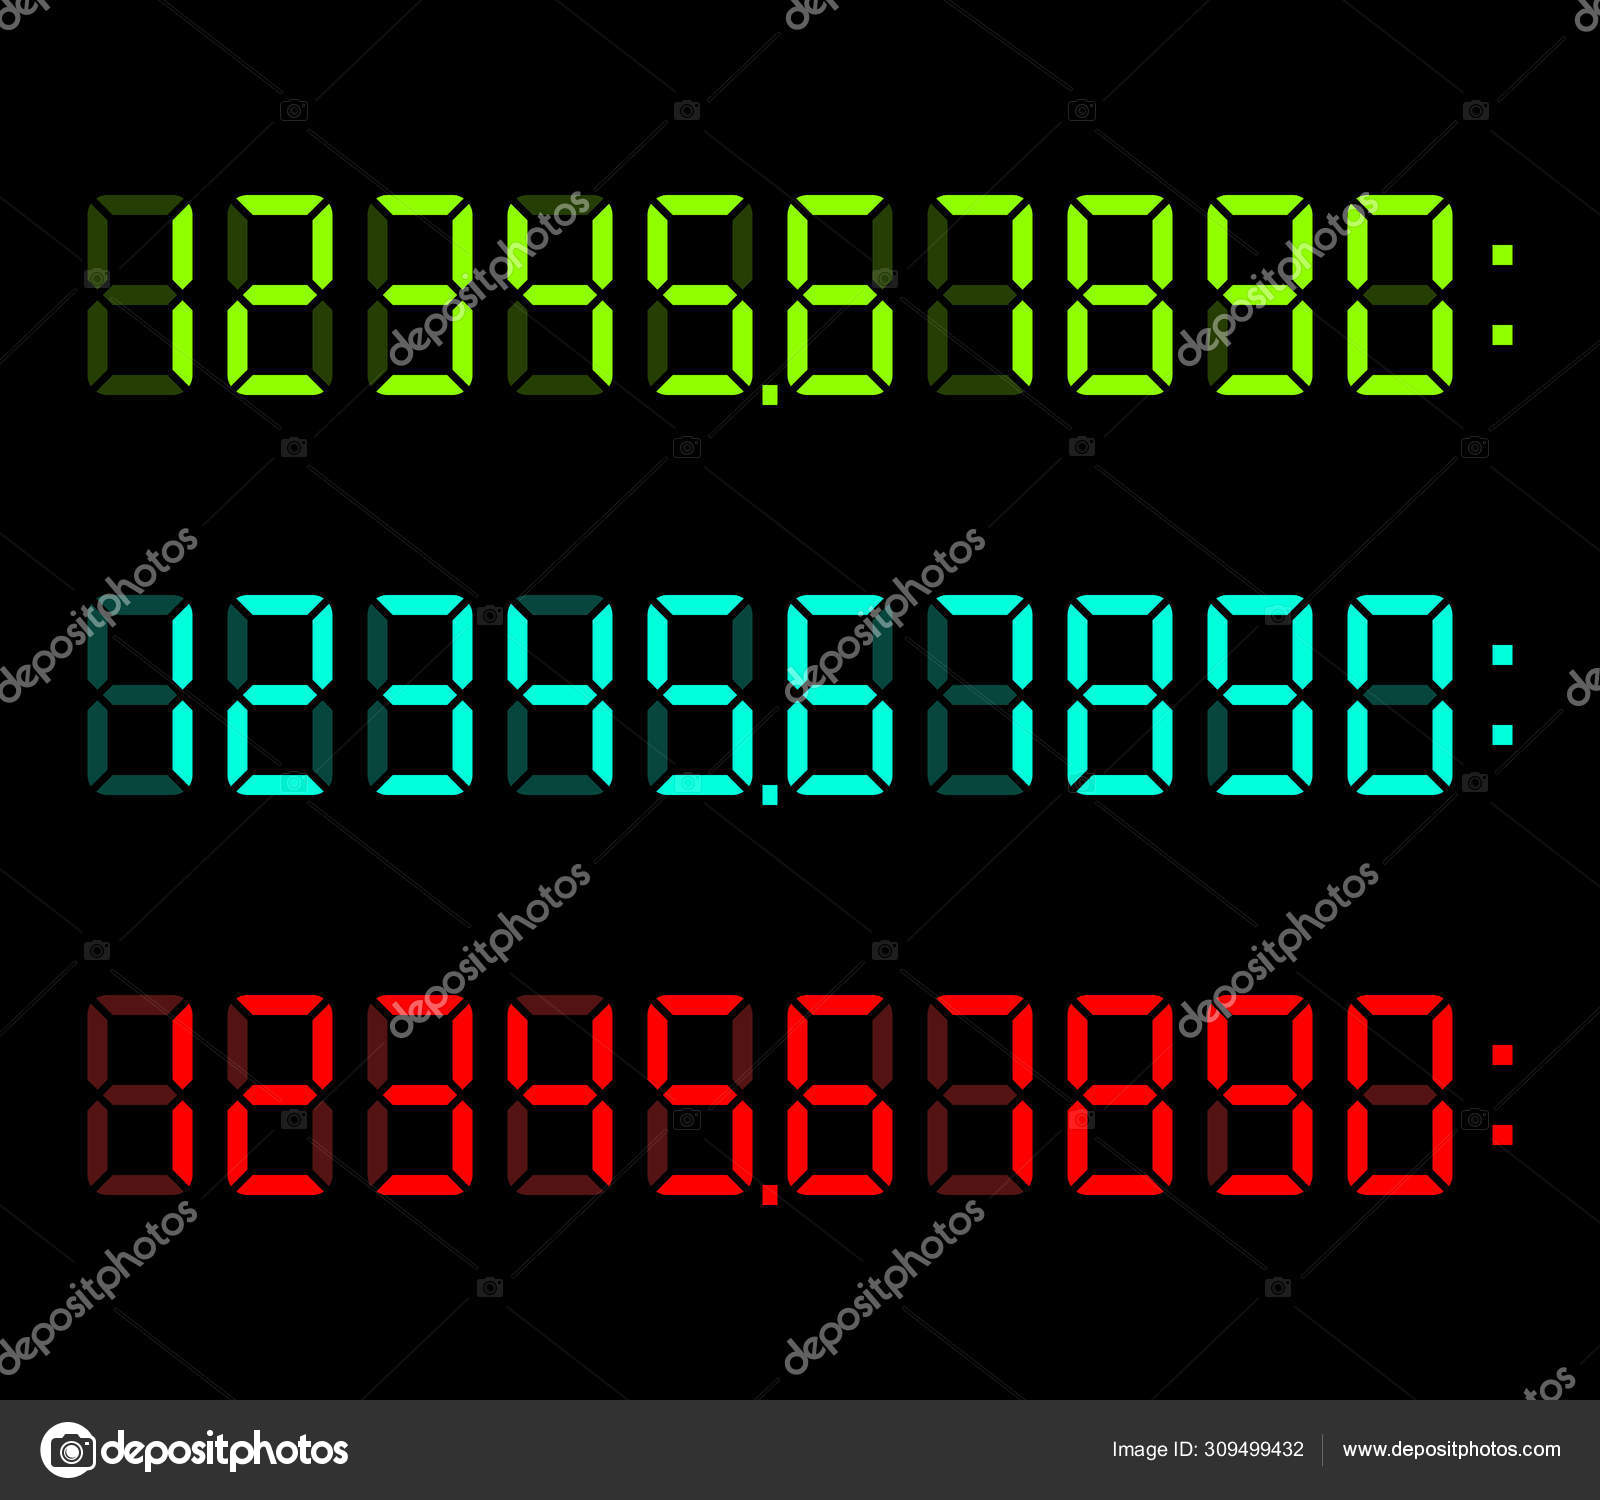 Neon Digital Display Font Stock Vector C Dmitry Guzhanin 309499432